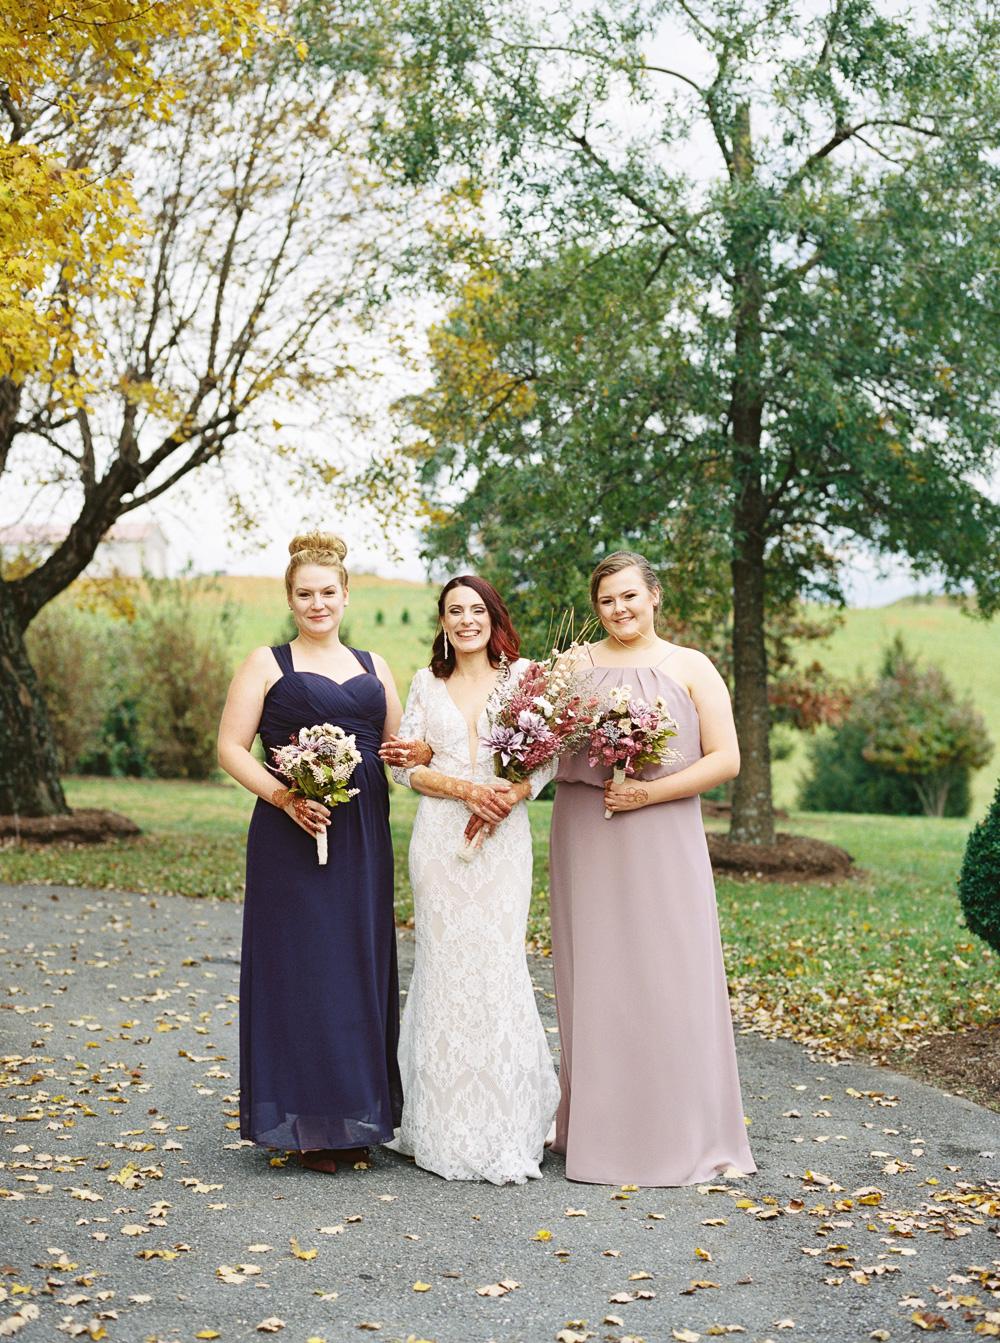 purple-and-pink-bridesmaids-dresses-fall-wedding-ideas